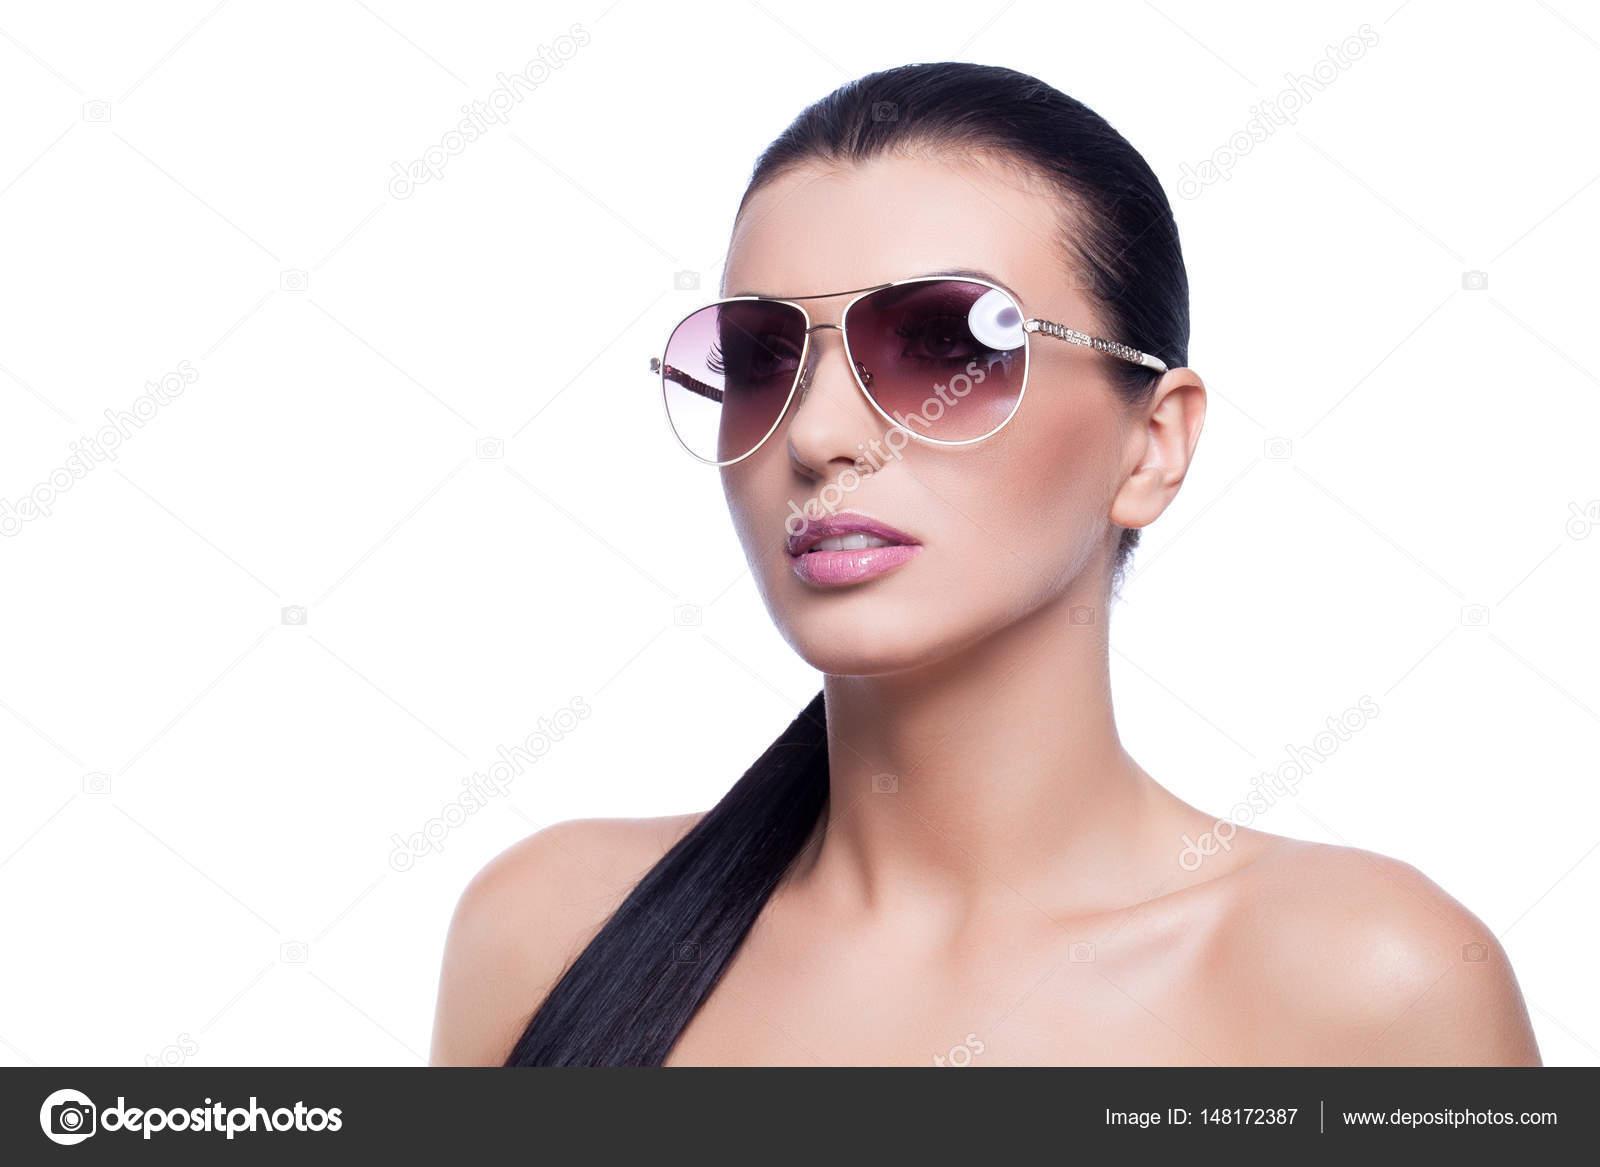 289f44e3fe Όμορφη μελαχρινή νεαρή γυναίκα σε γυαλιά ηλίου. Απομονωμένα σε λευκό φόντο.  Χώρο αντίγραφο — Εικόνα από ...